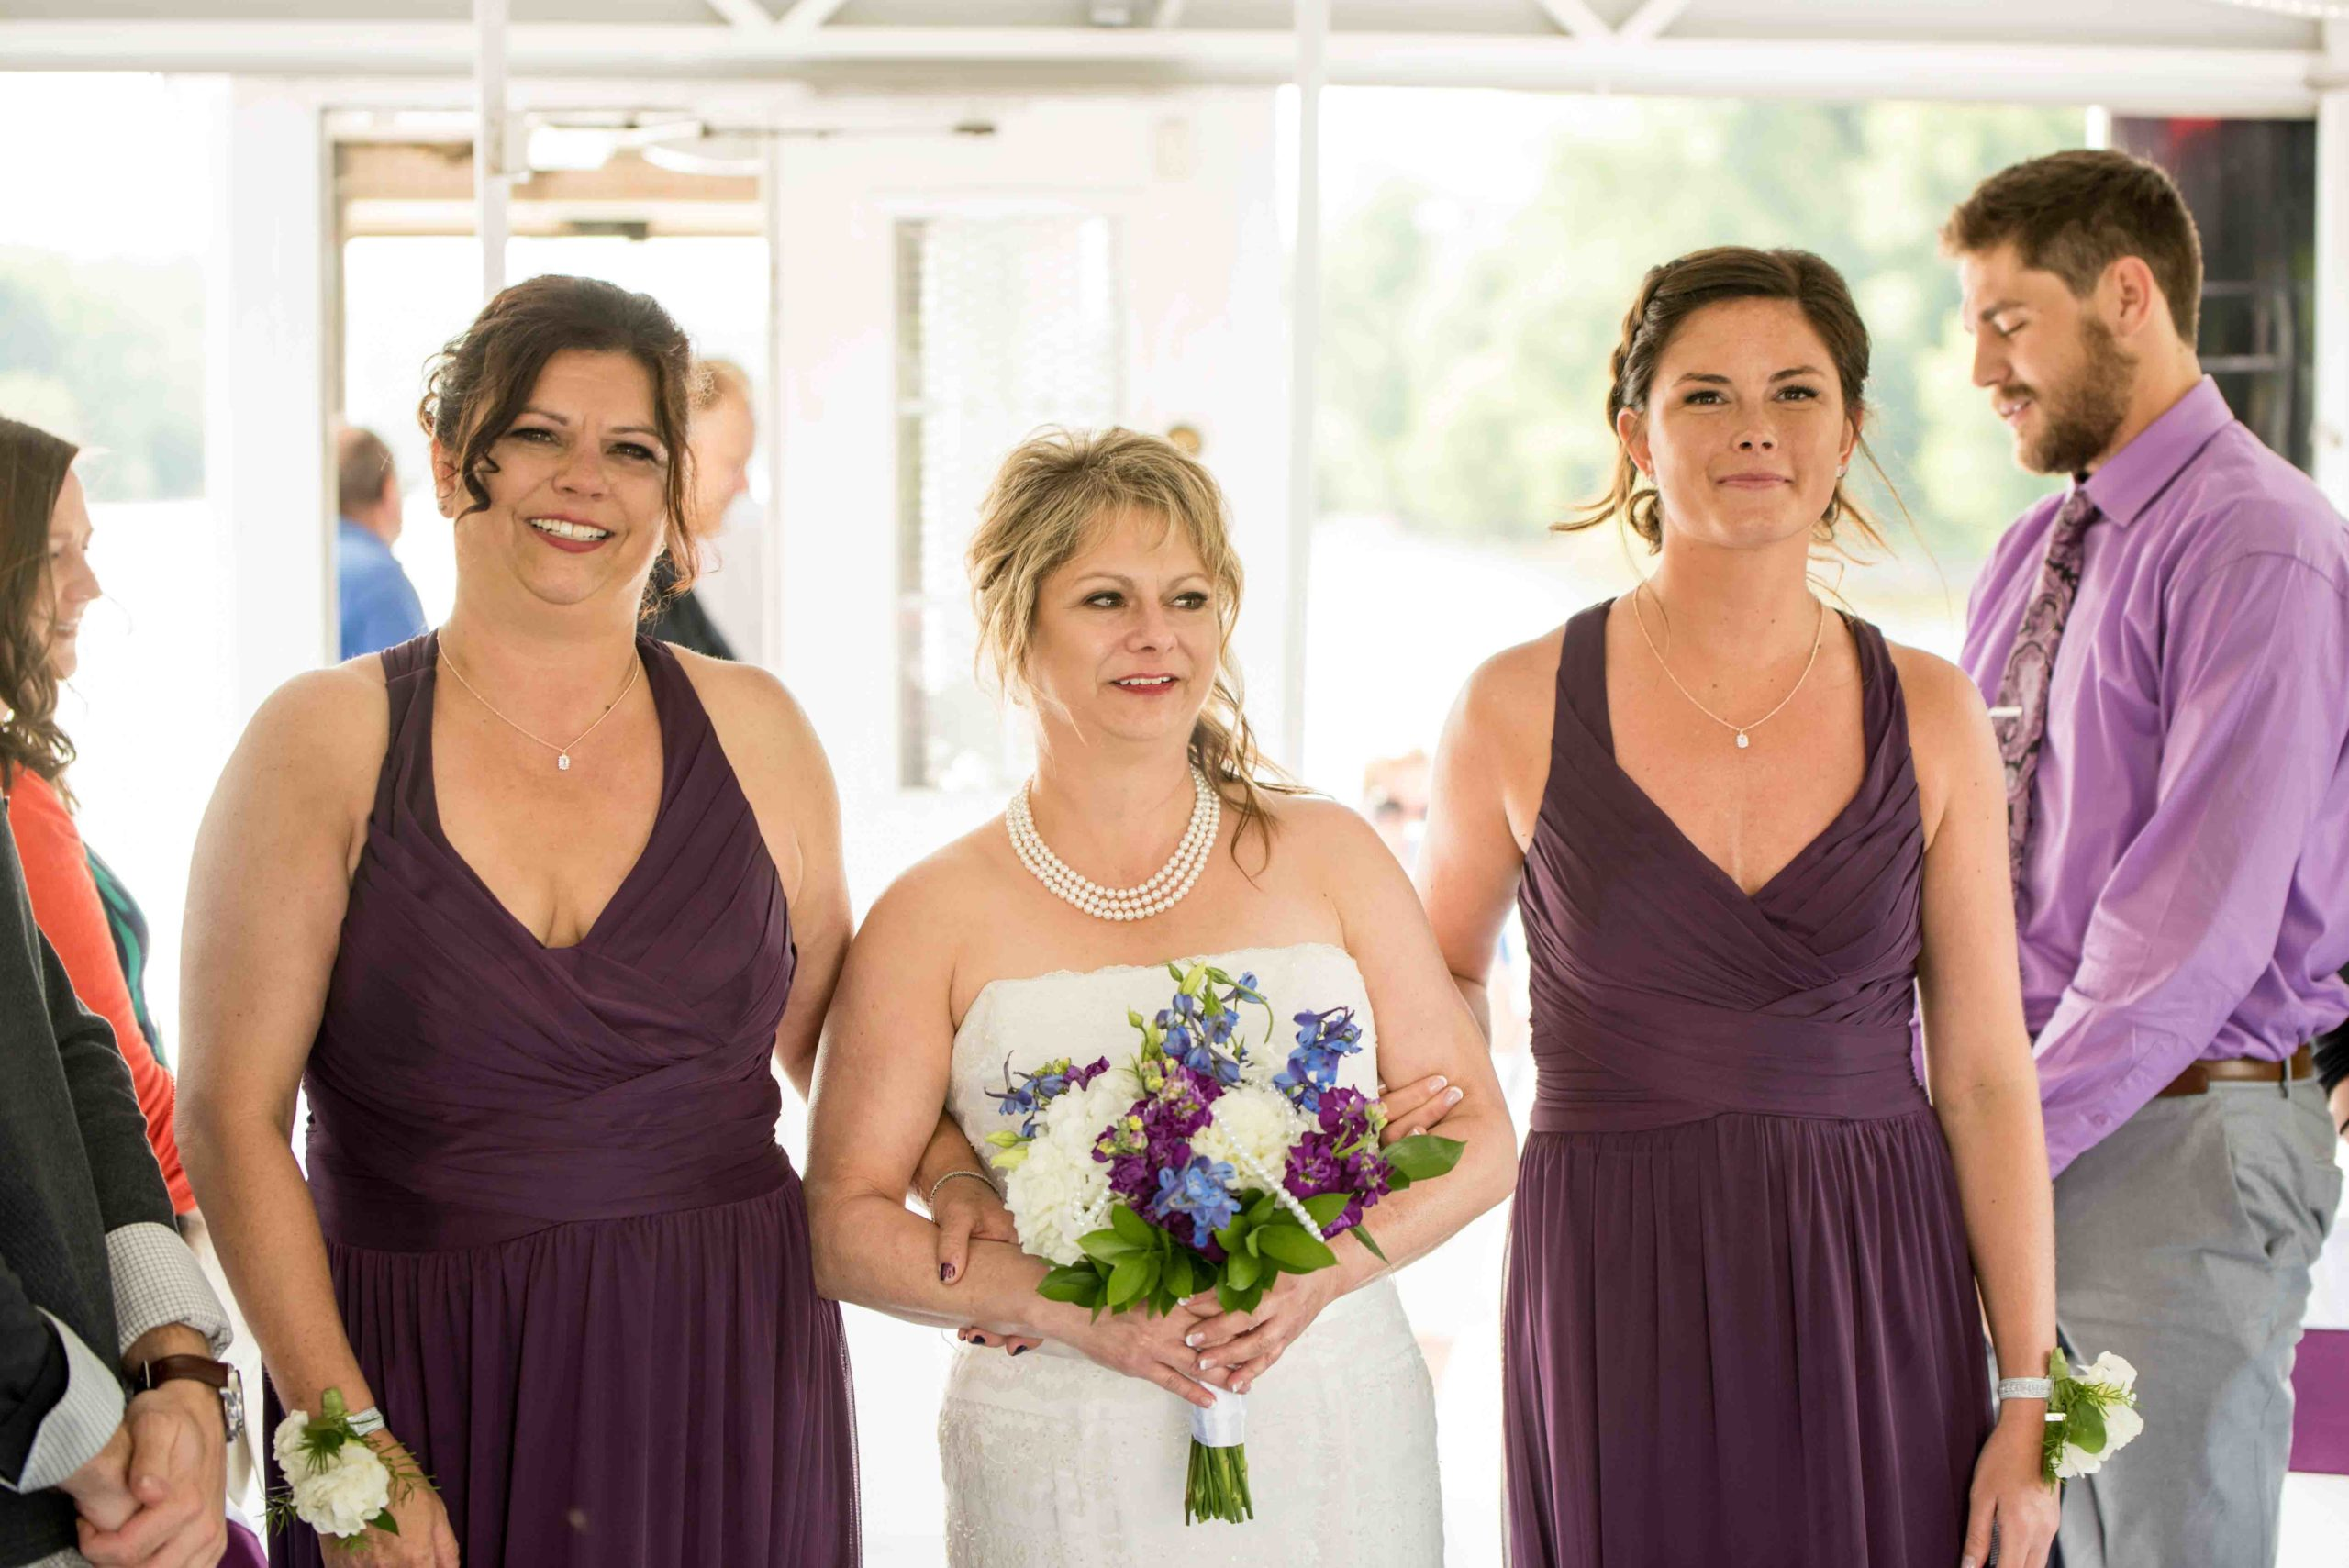 Bride - Magnolia Blossom Cruises